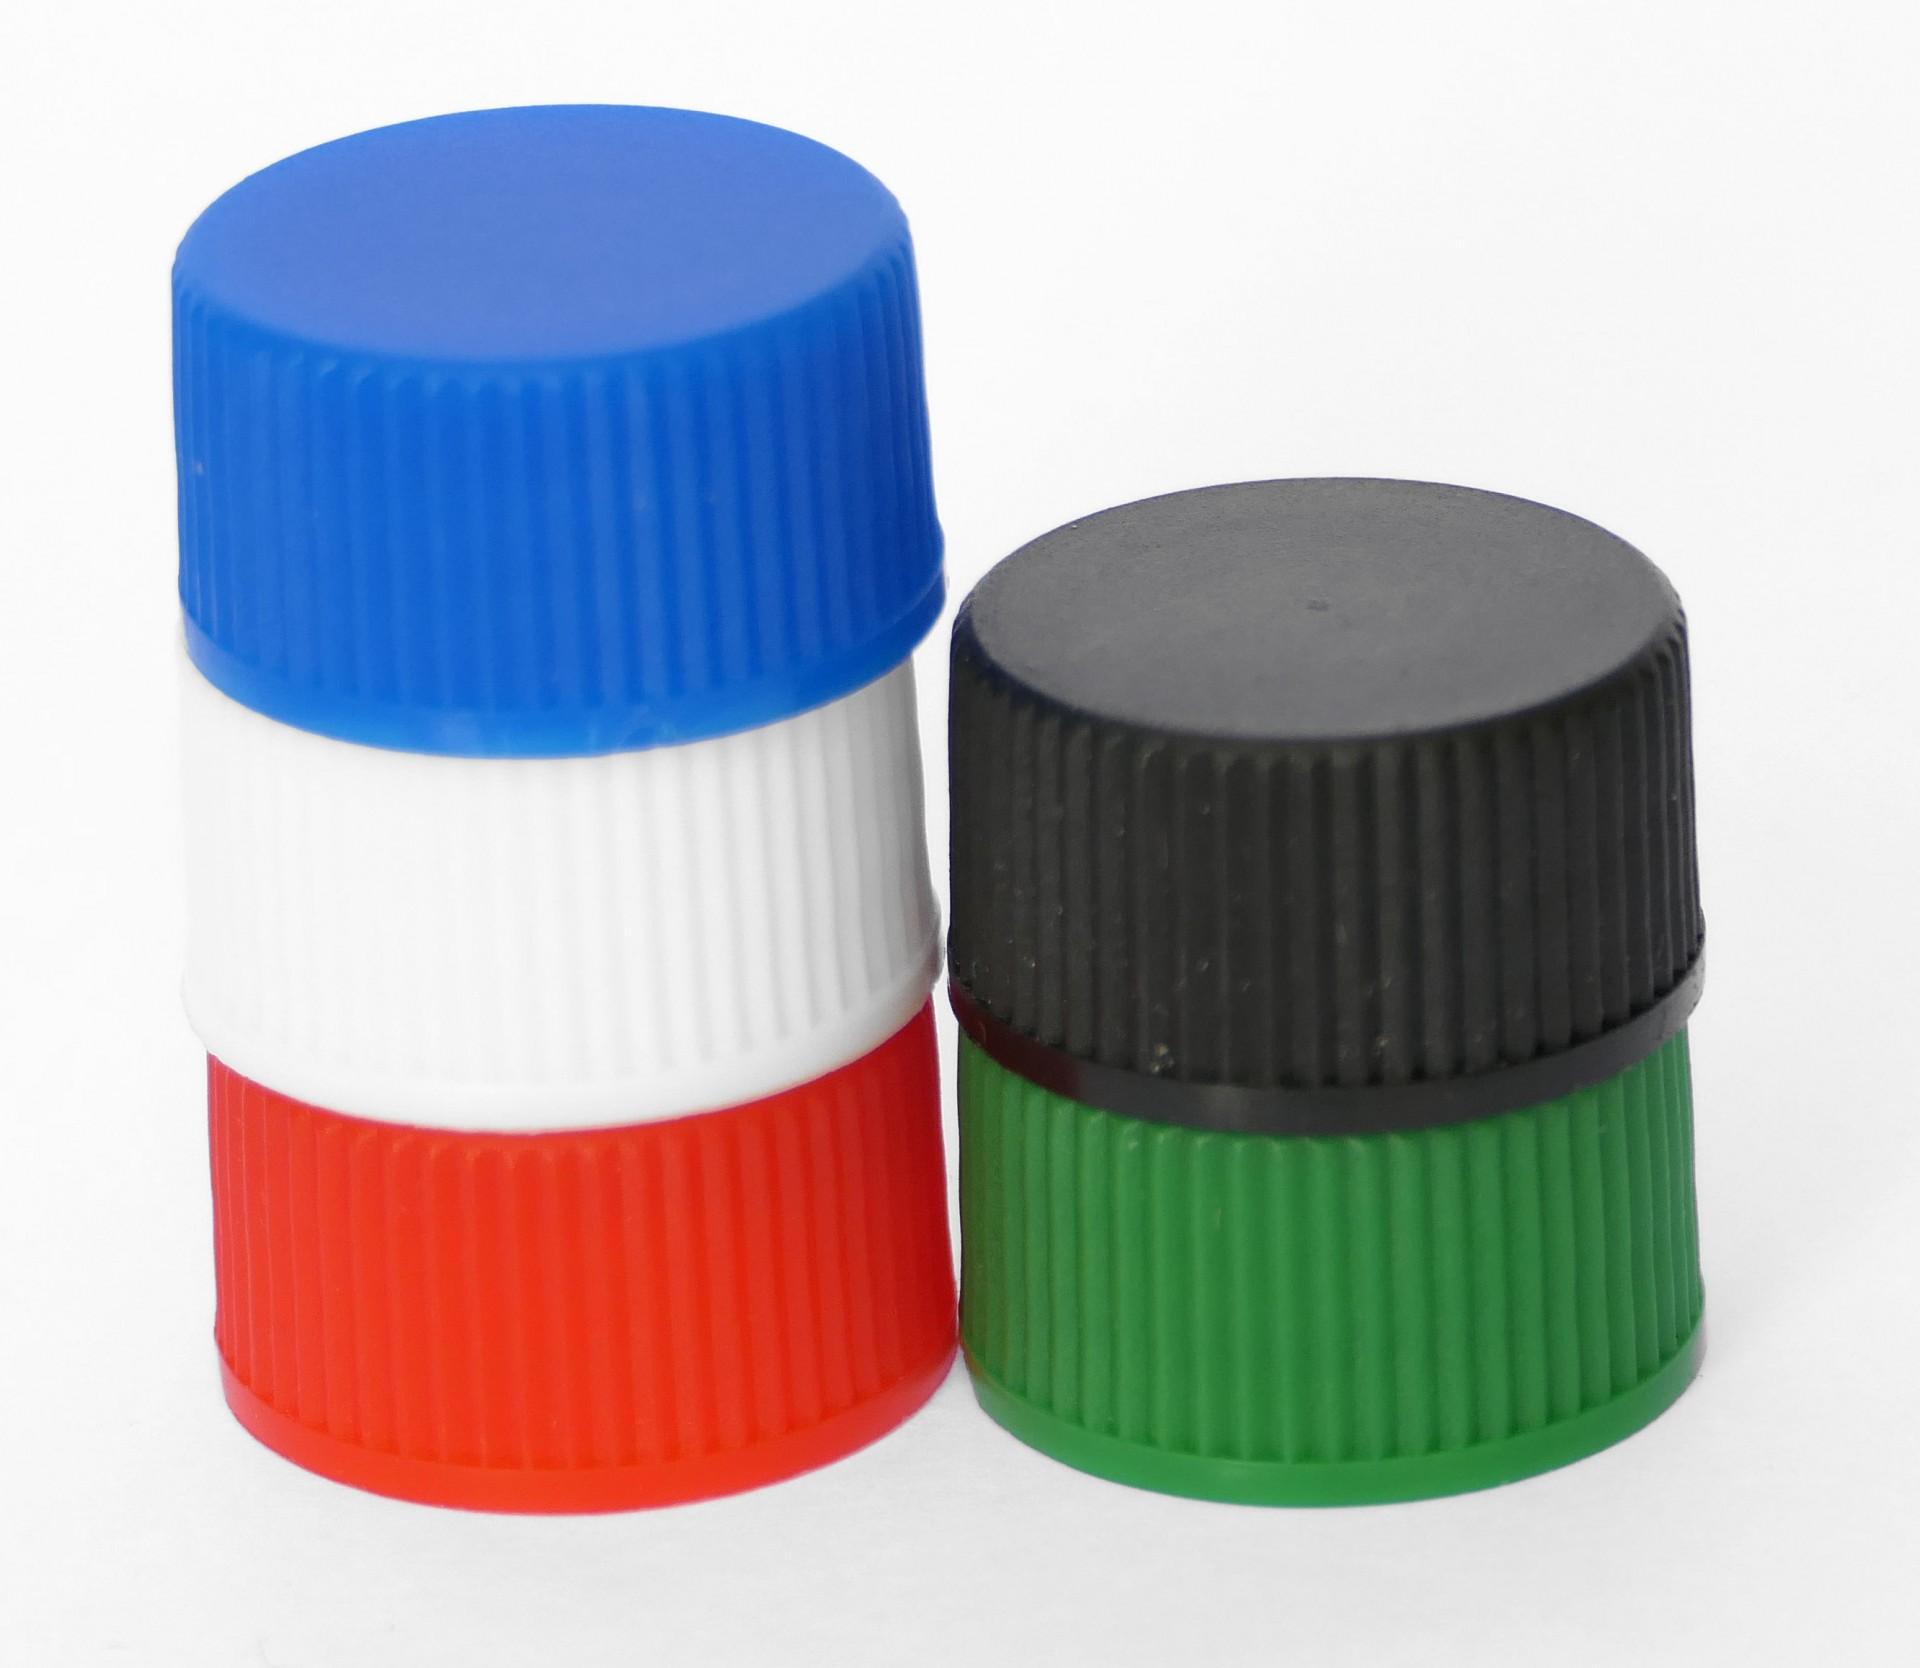 Caps for Glass Vials - Polypropylene (PP) & UREA